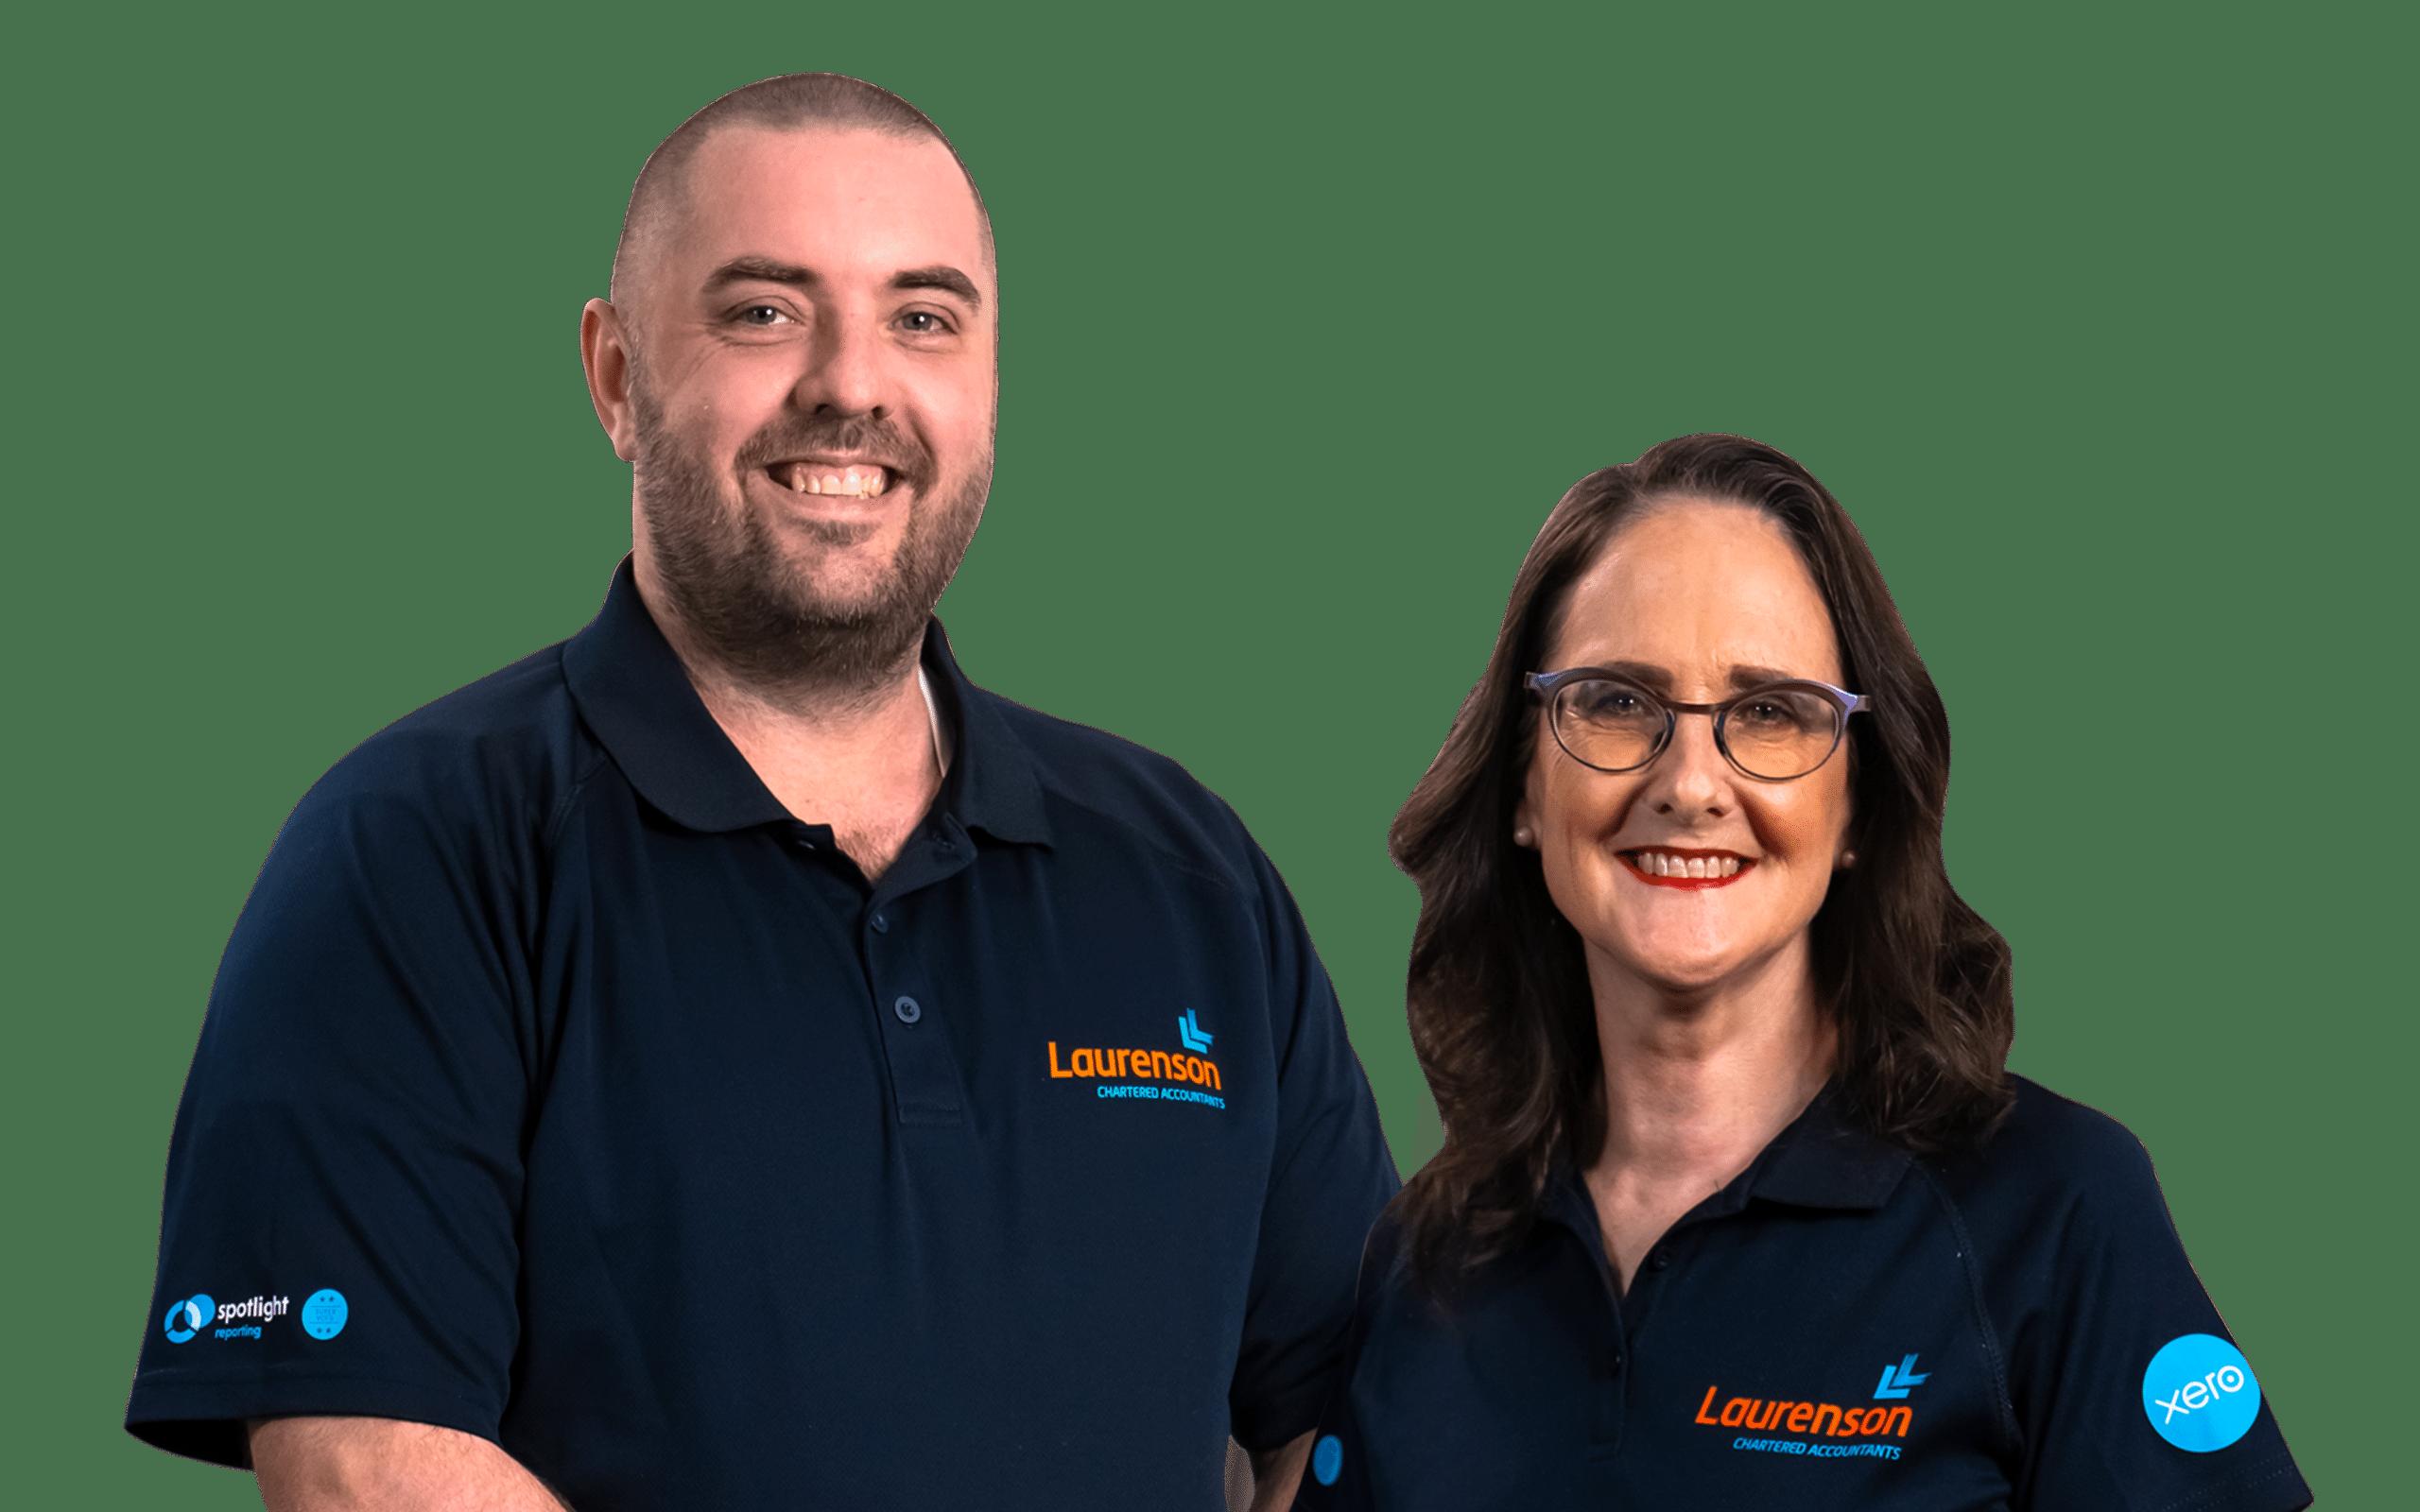 Laurenson Chartered Accountants